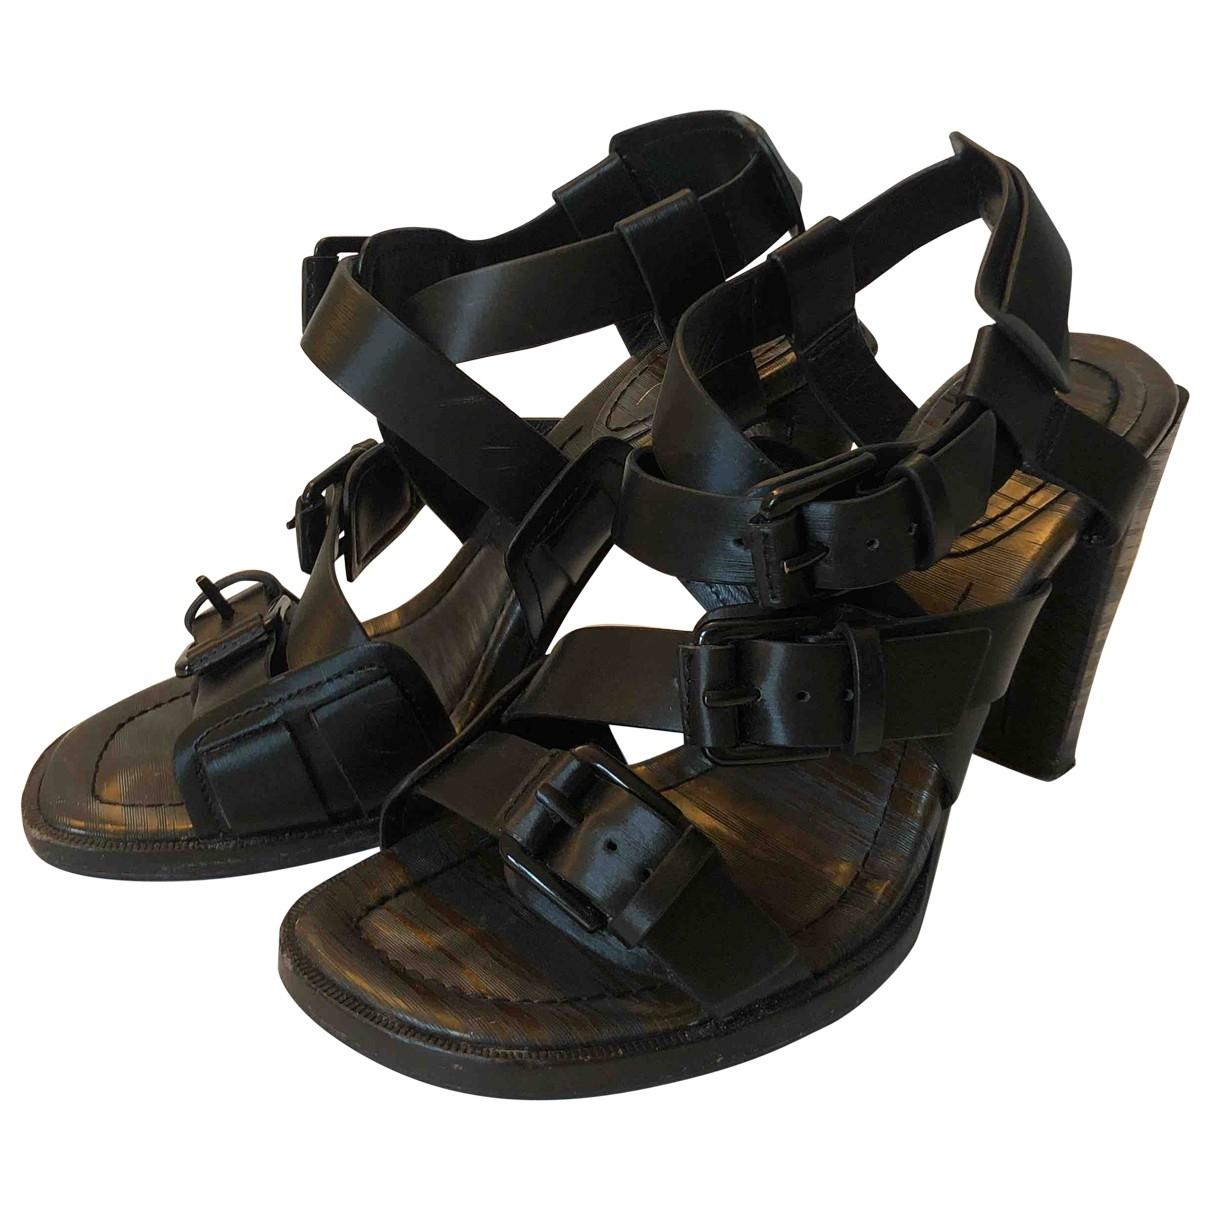 3.1 Phillip Lim \N Black Leather Sandals for Women 36 EU